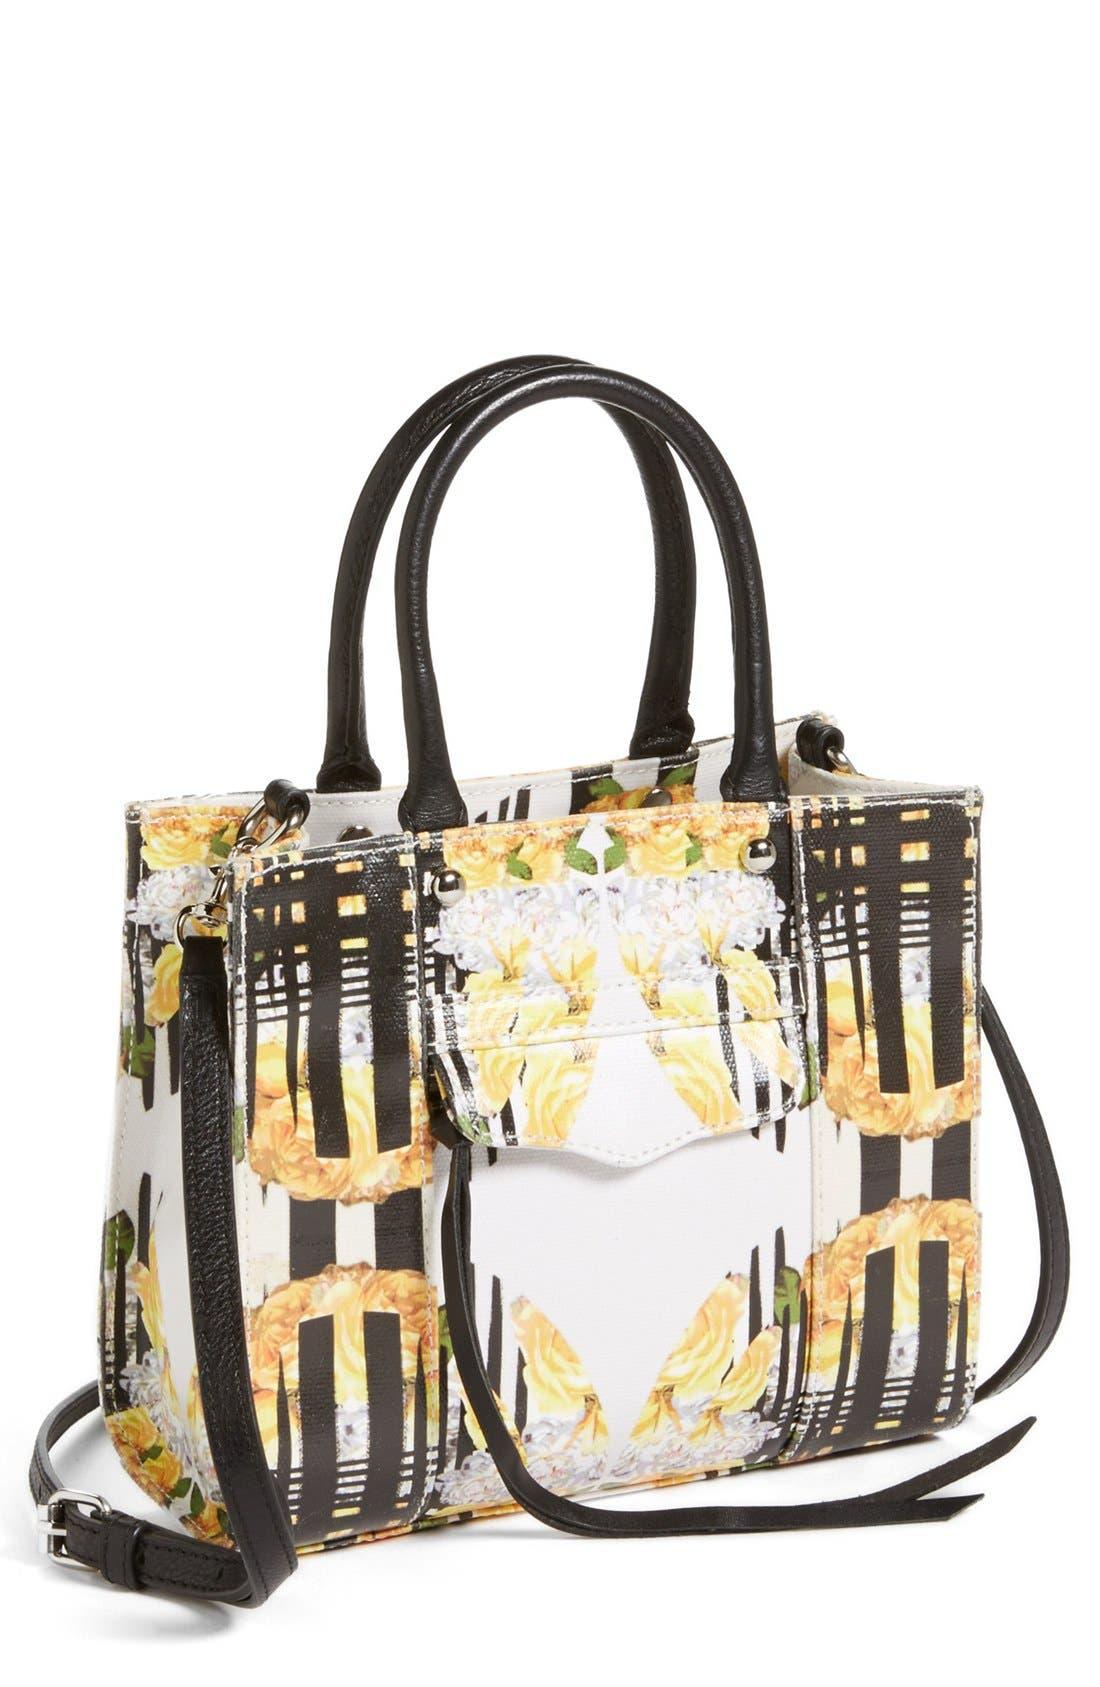 Alternate Image 1 Selected - Rebecca Minkoff 'Mini MAB Tote' Crossbody Bag